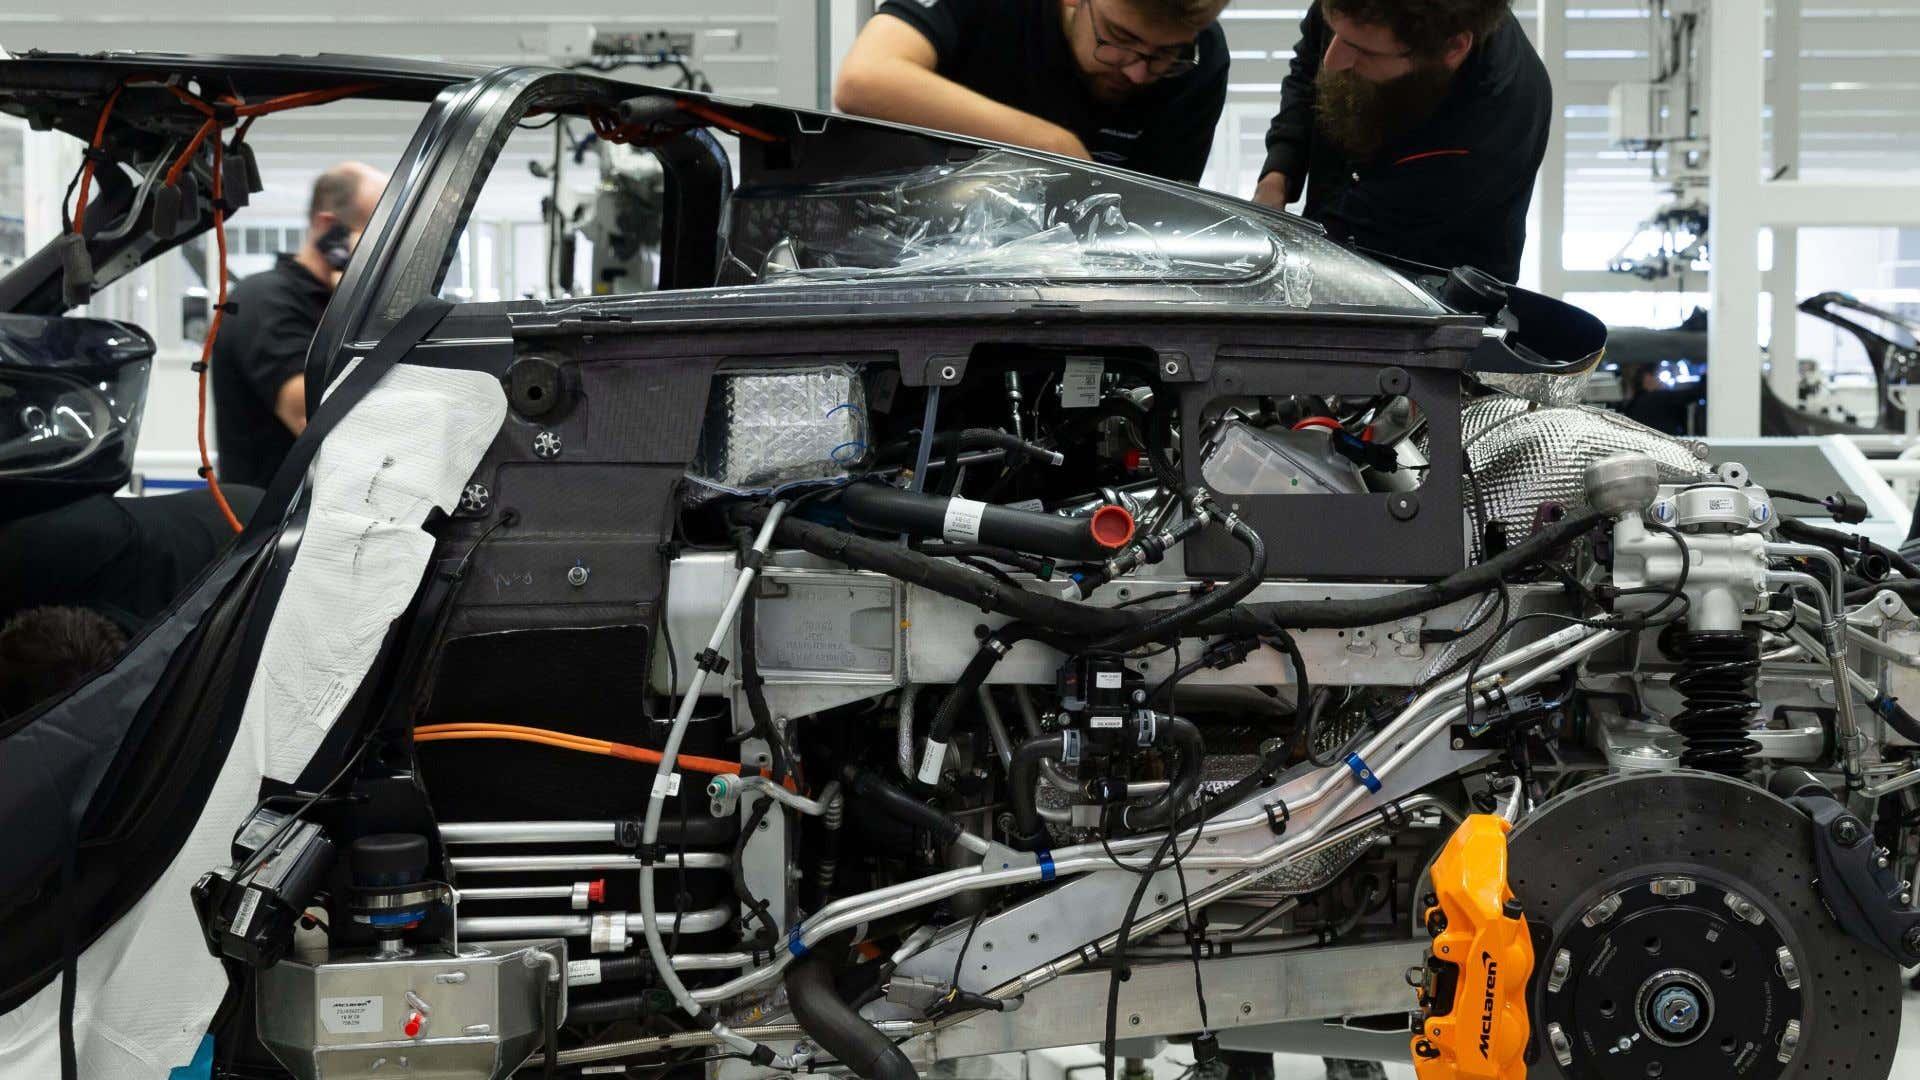 The hybrid McLaren Speedtail being assembled.